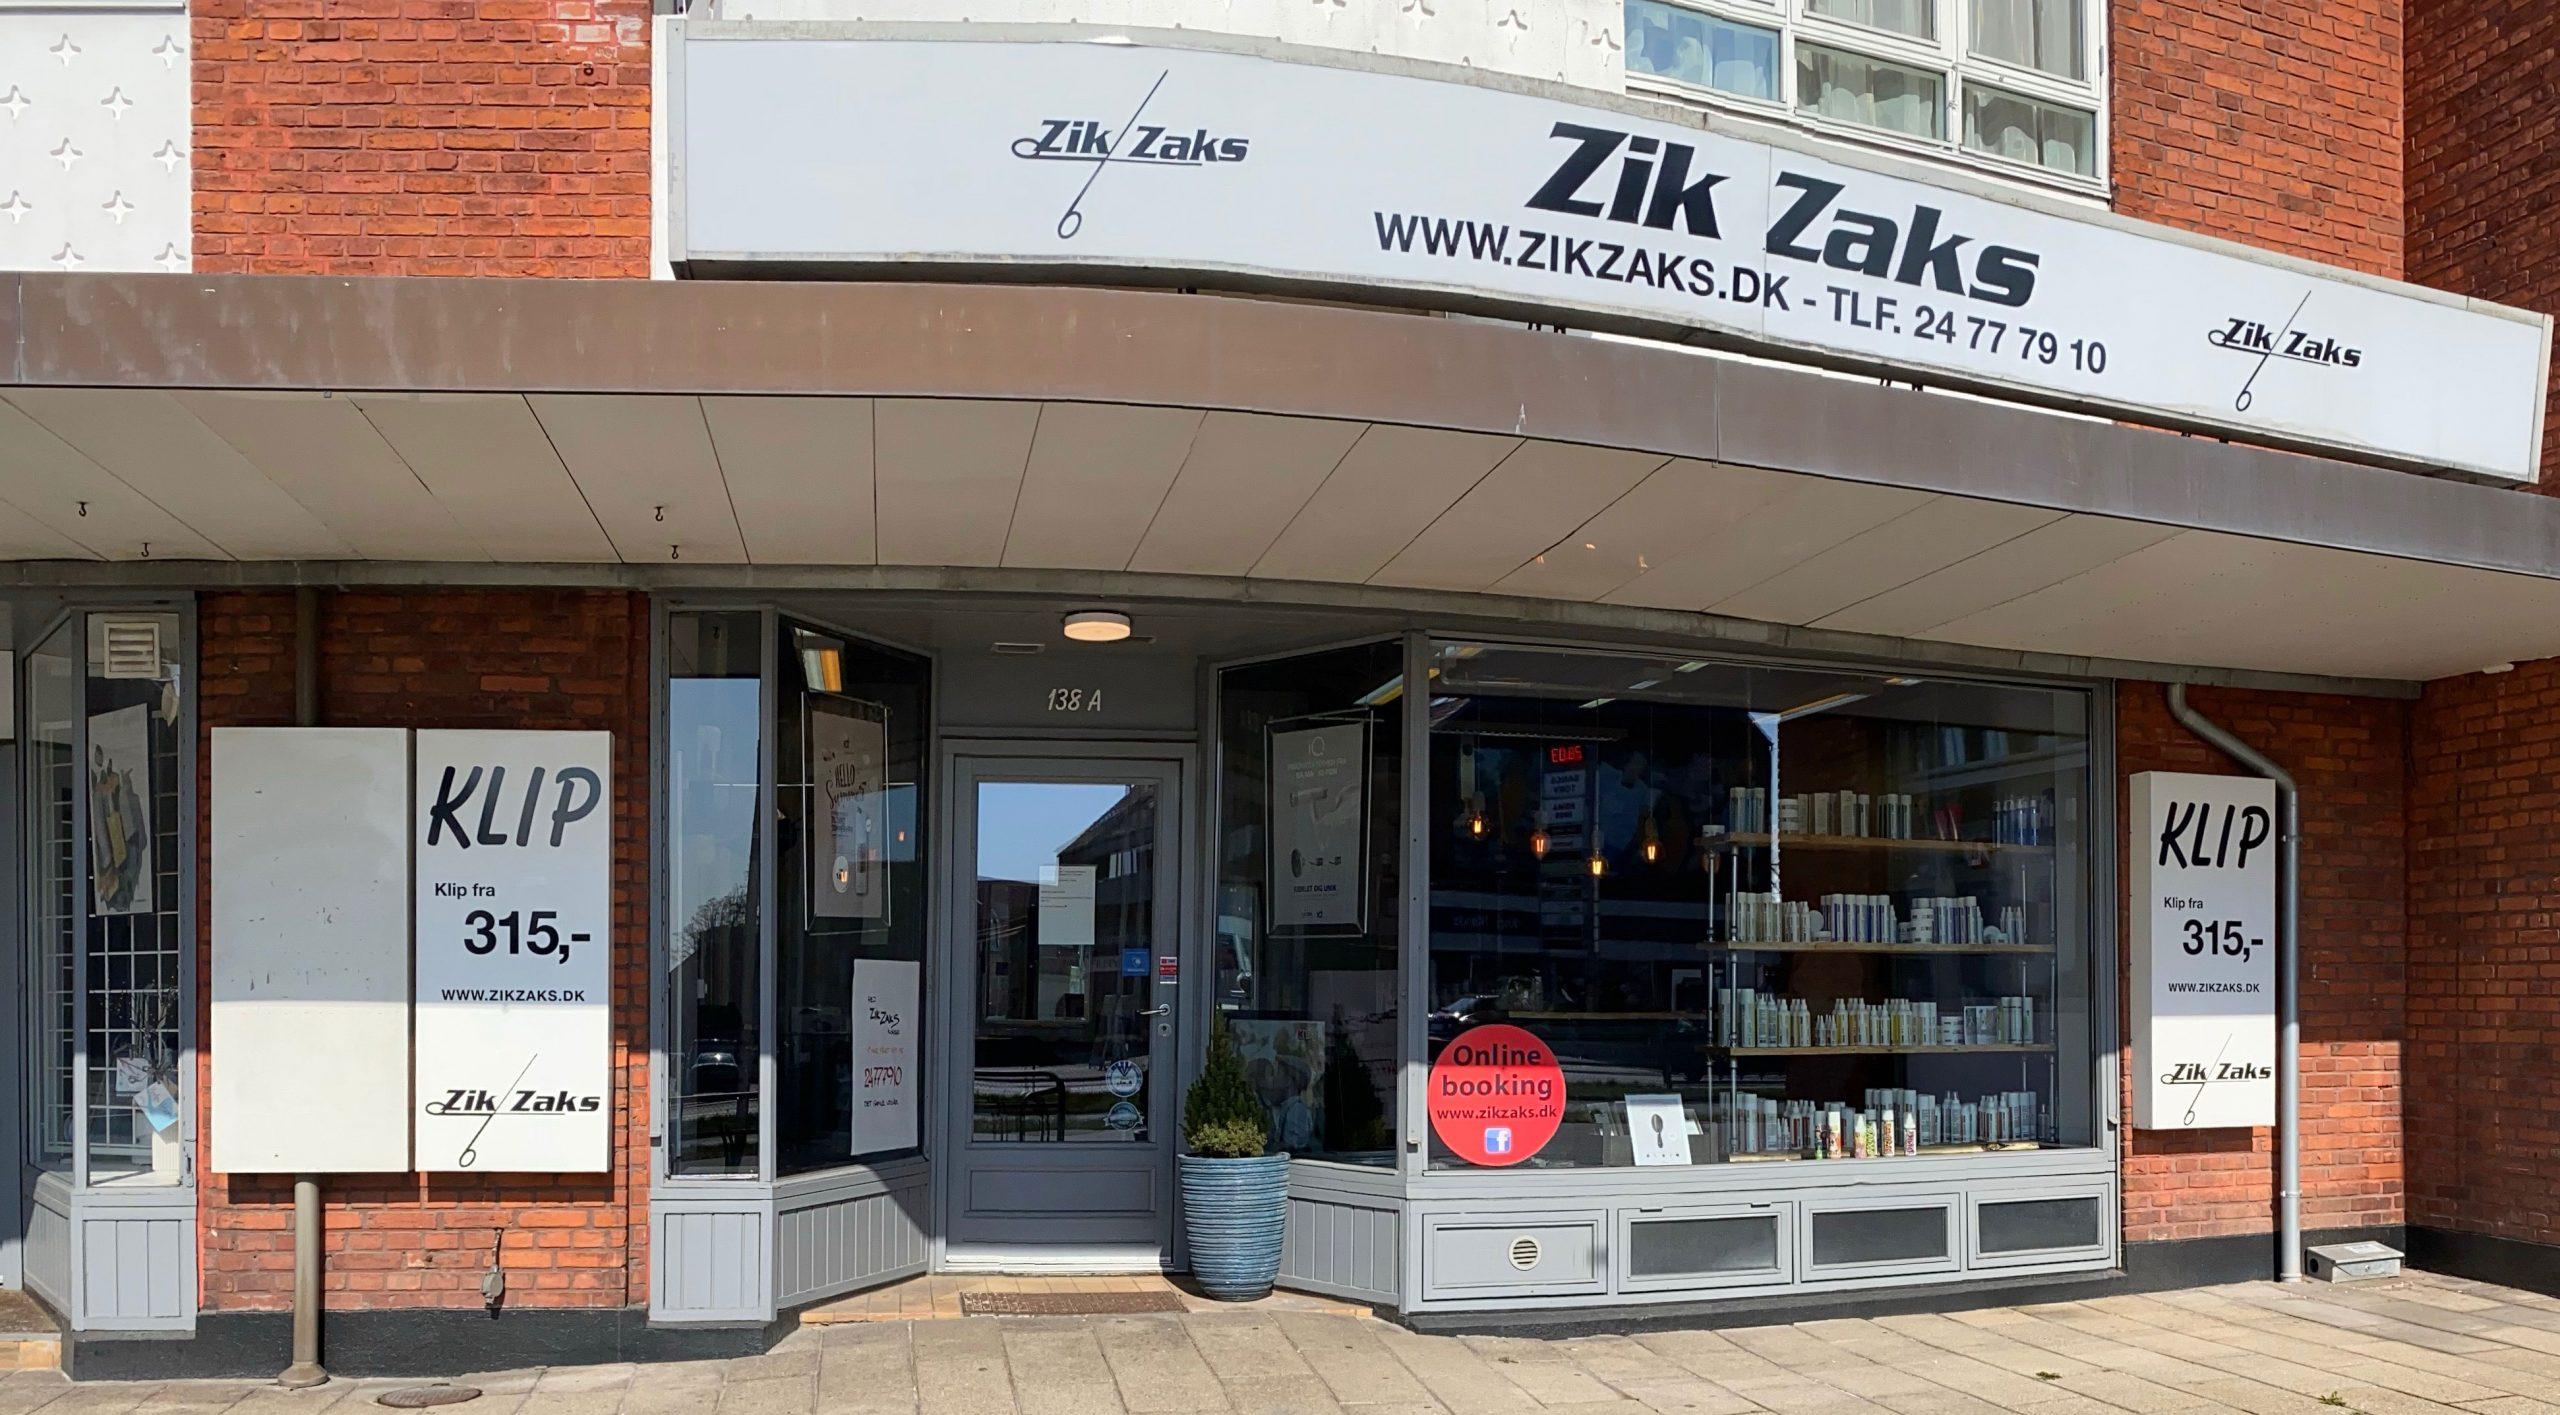 Zik Zaks salonens facade